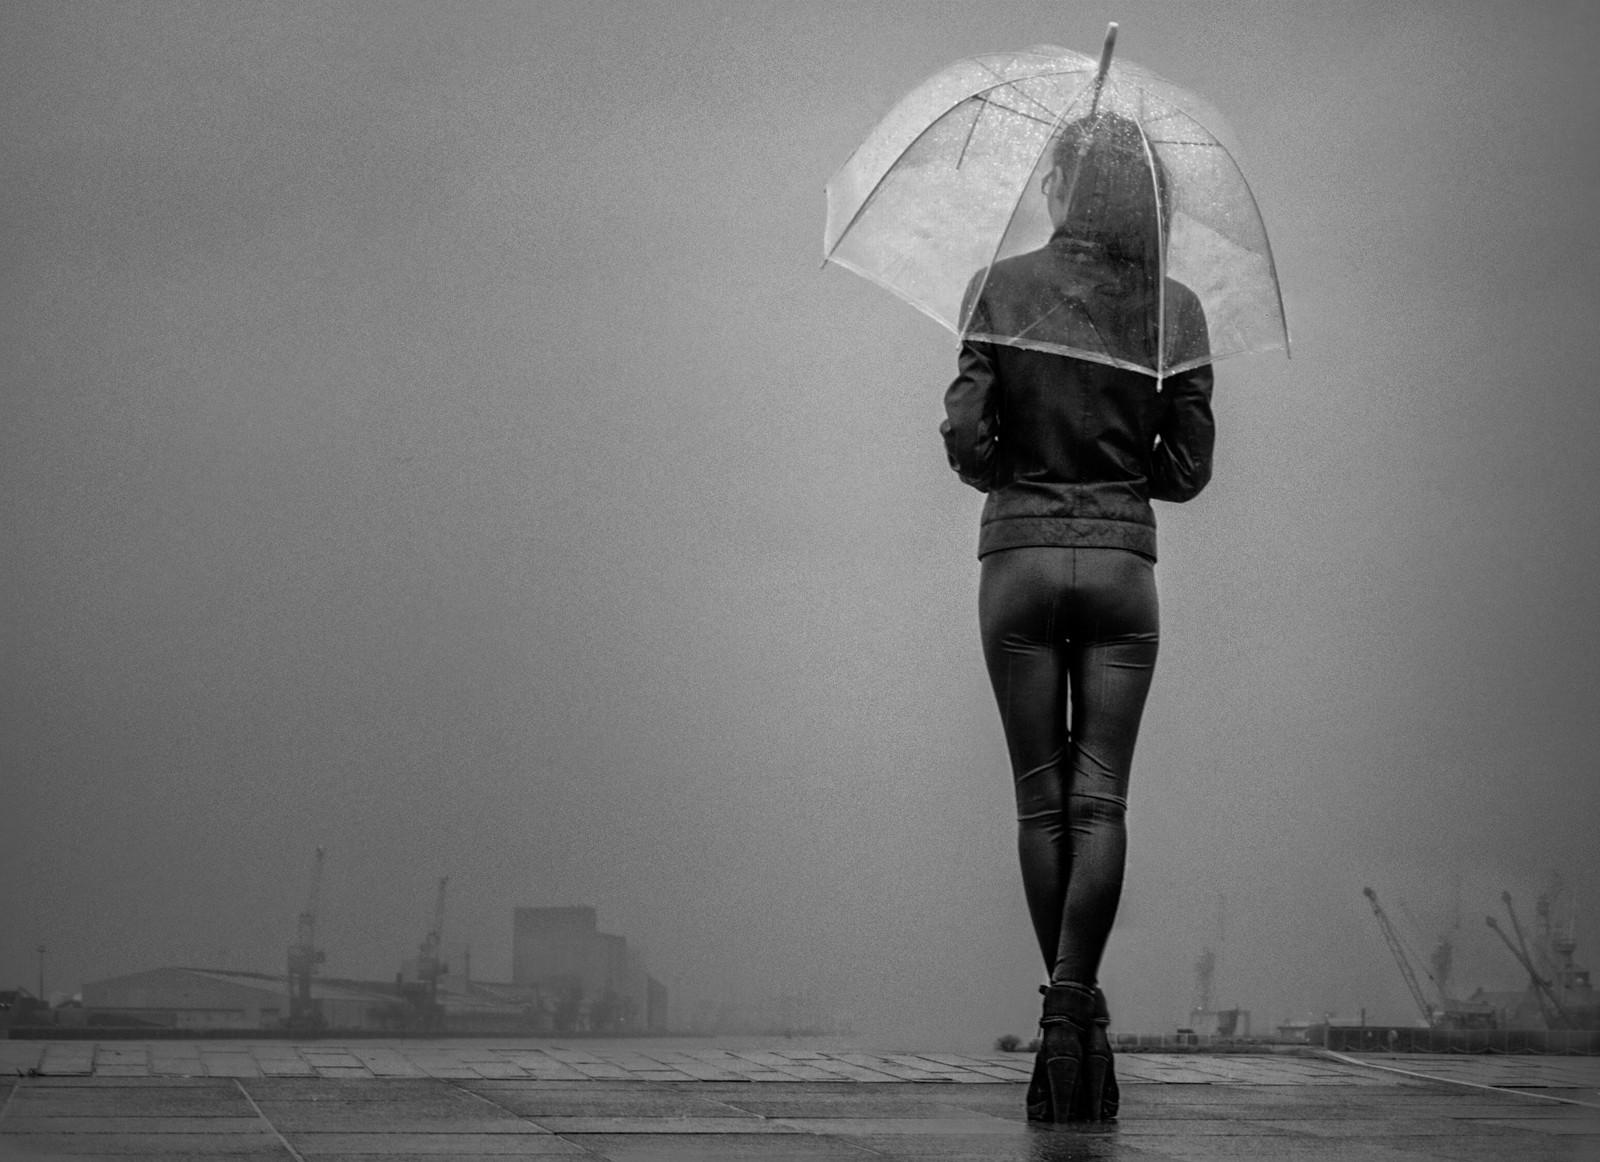 MONO - Umbrella - Rihanna by Adrian Quinn (12 marks)